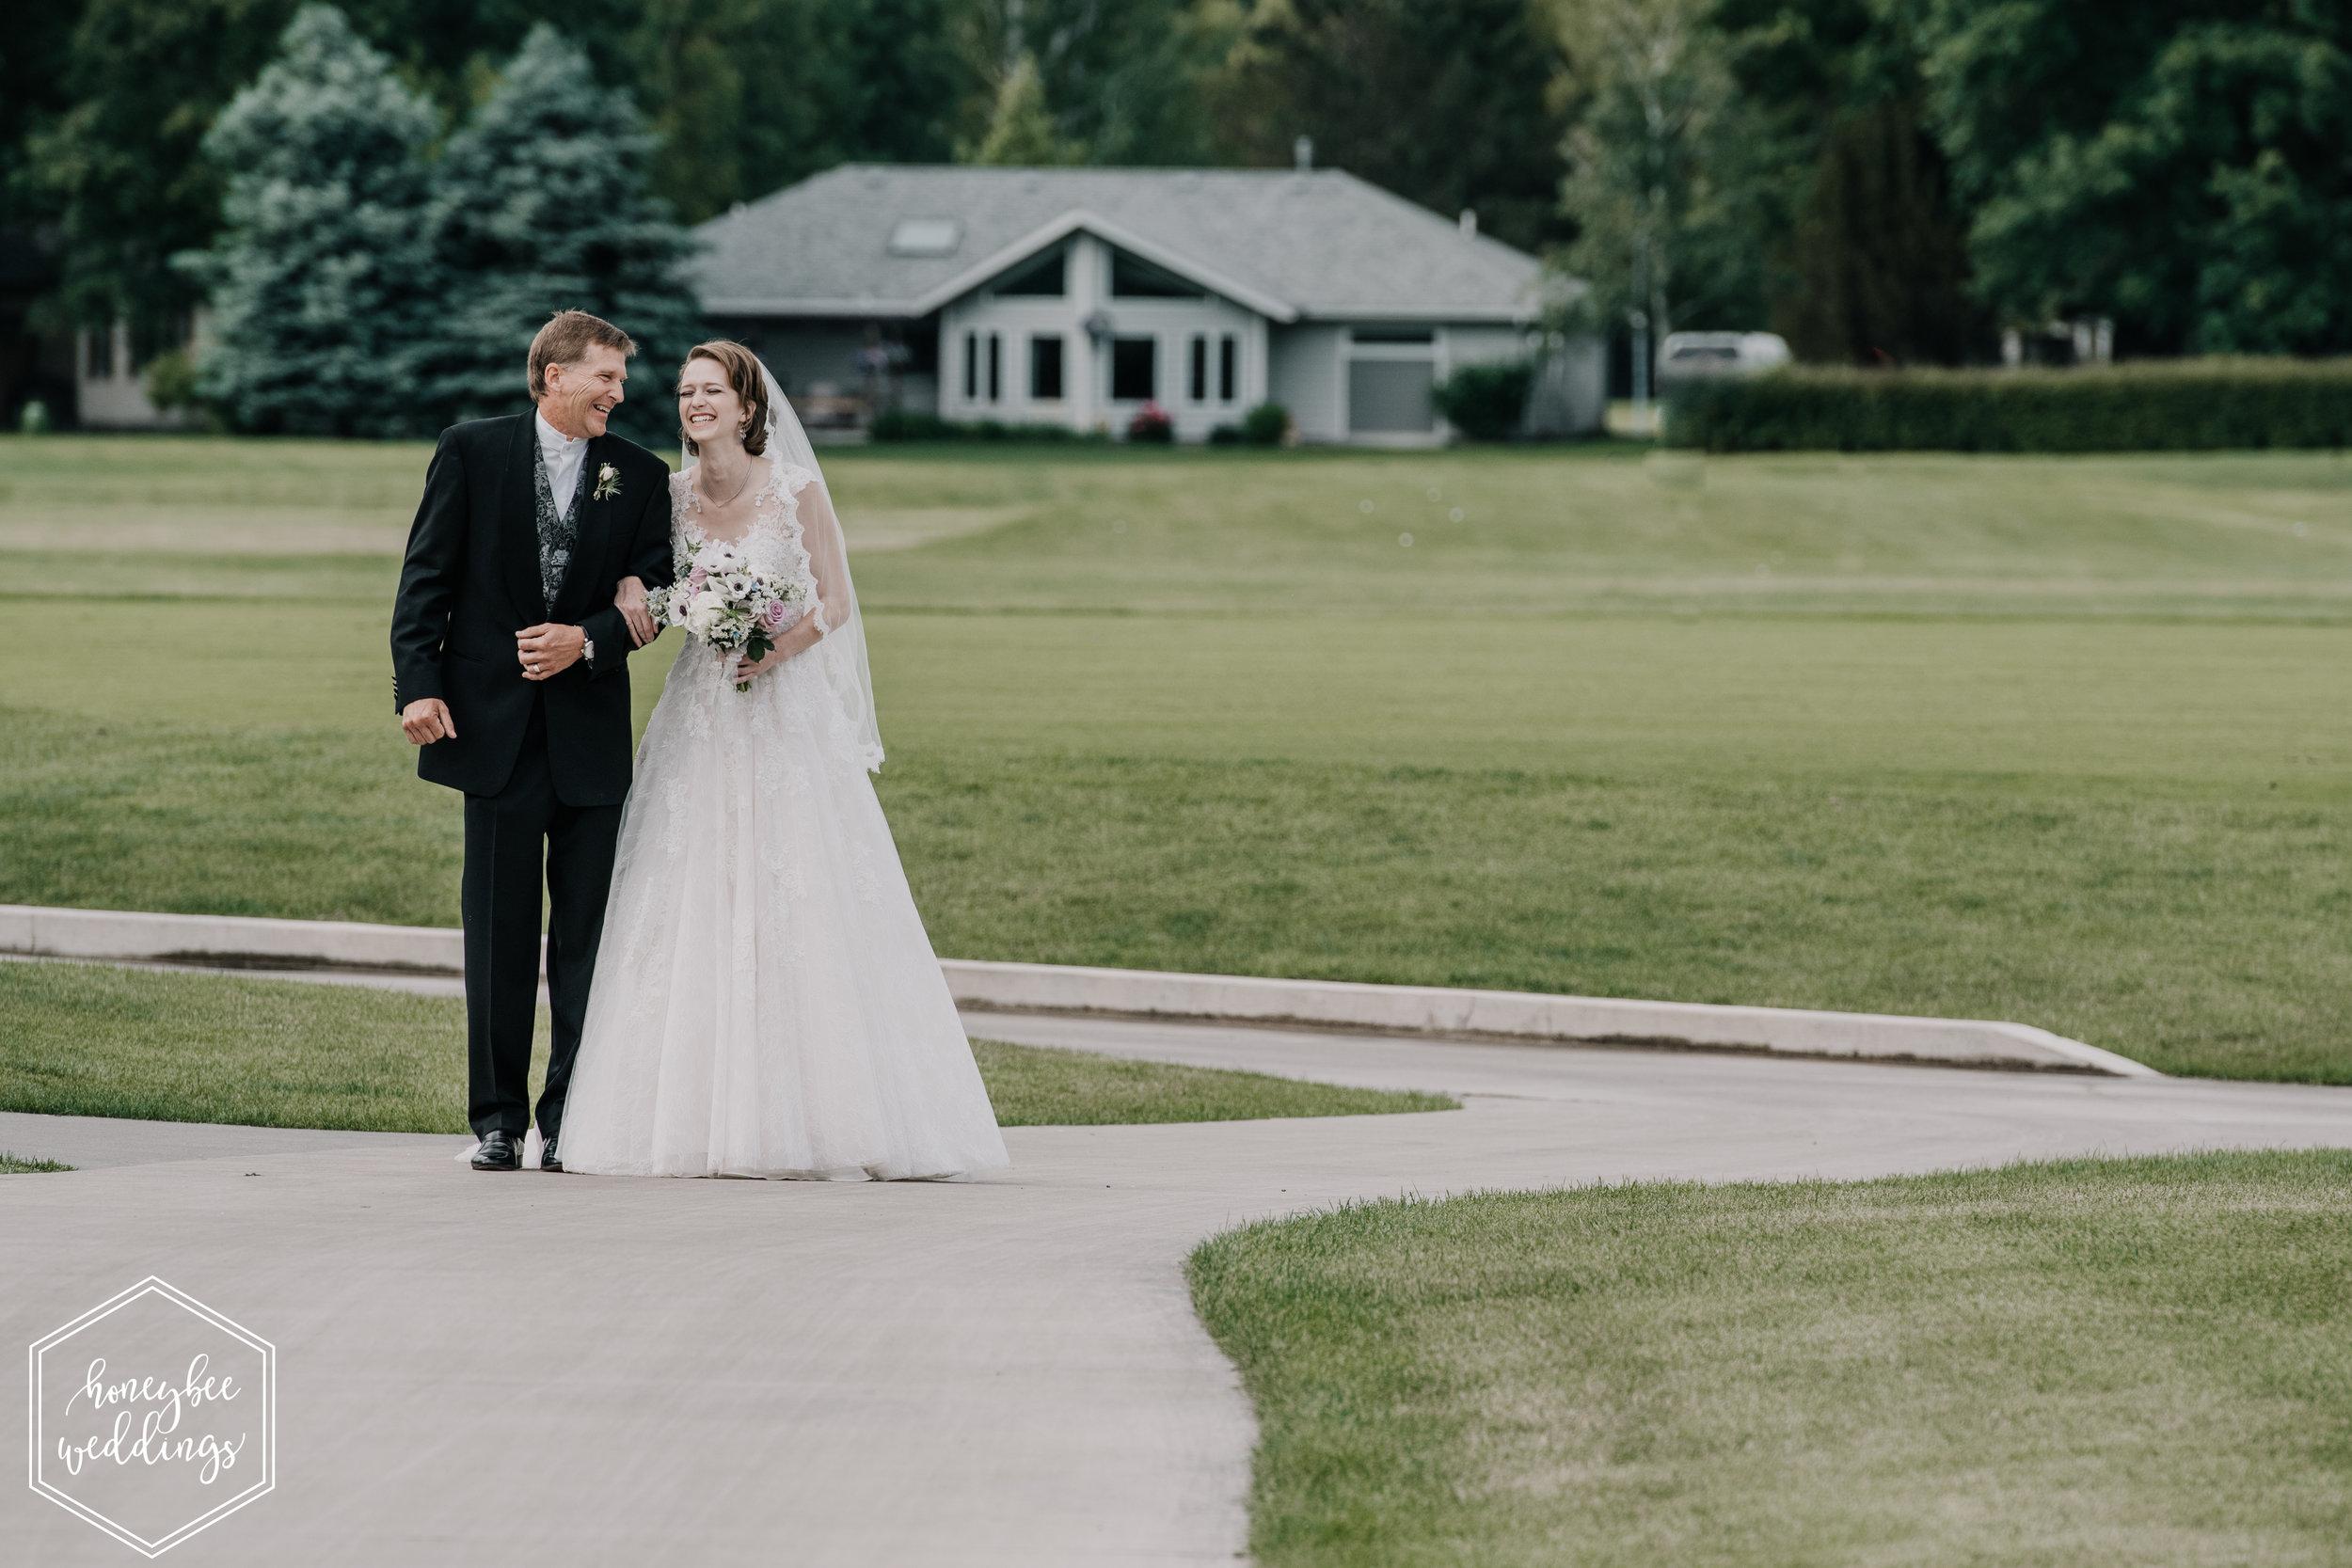 599 Riverside Country Club Wedding_Montana Wedding Photographer_Lauren Jackson + Evan Ivaldi 2018-6828-2.jpg